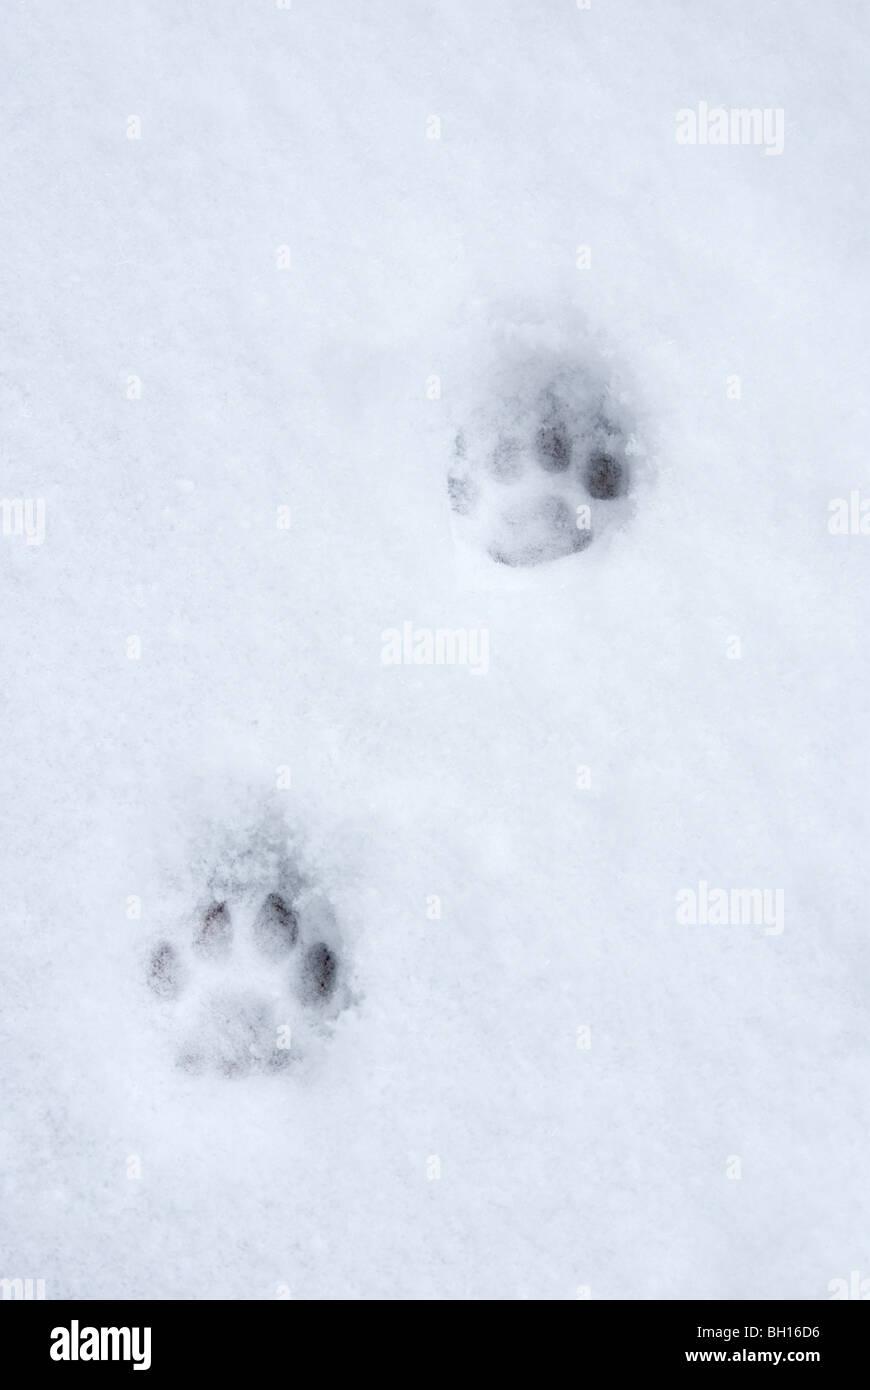 cat padprint in snow - Stock Image